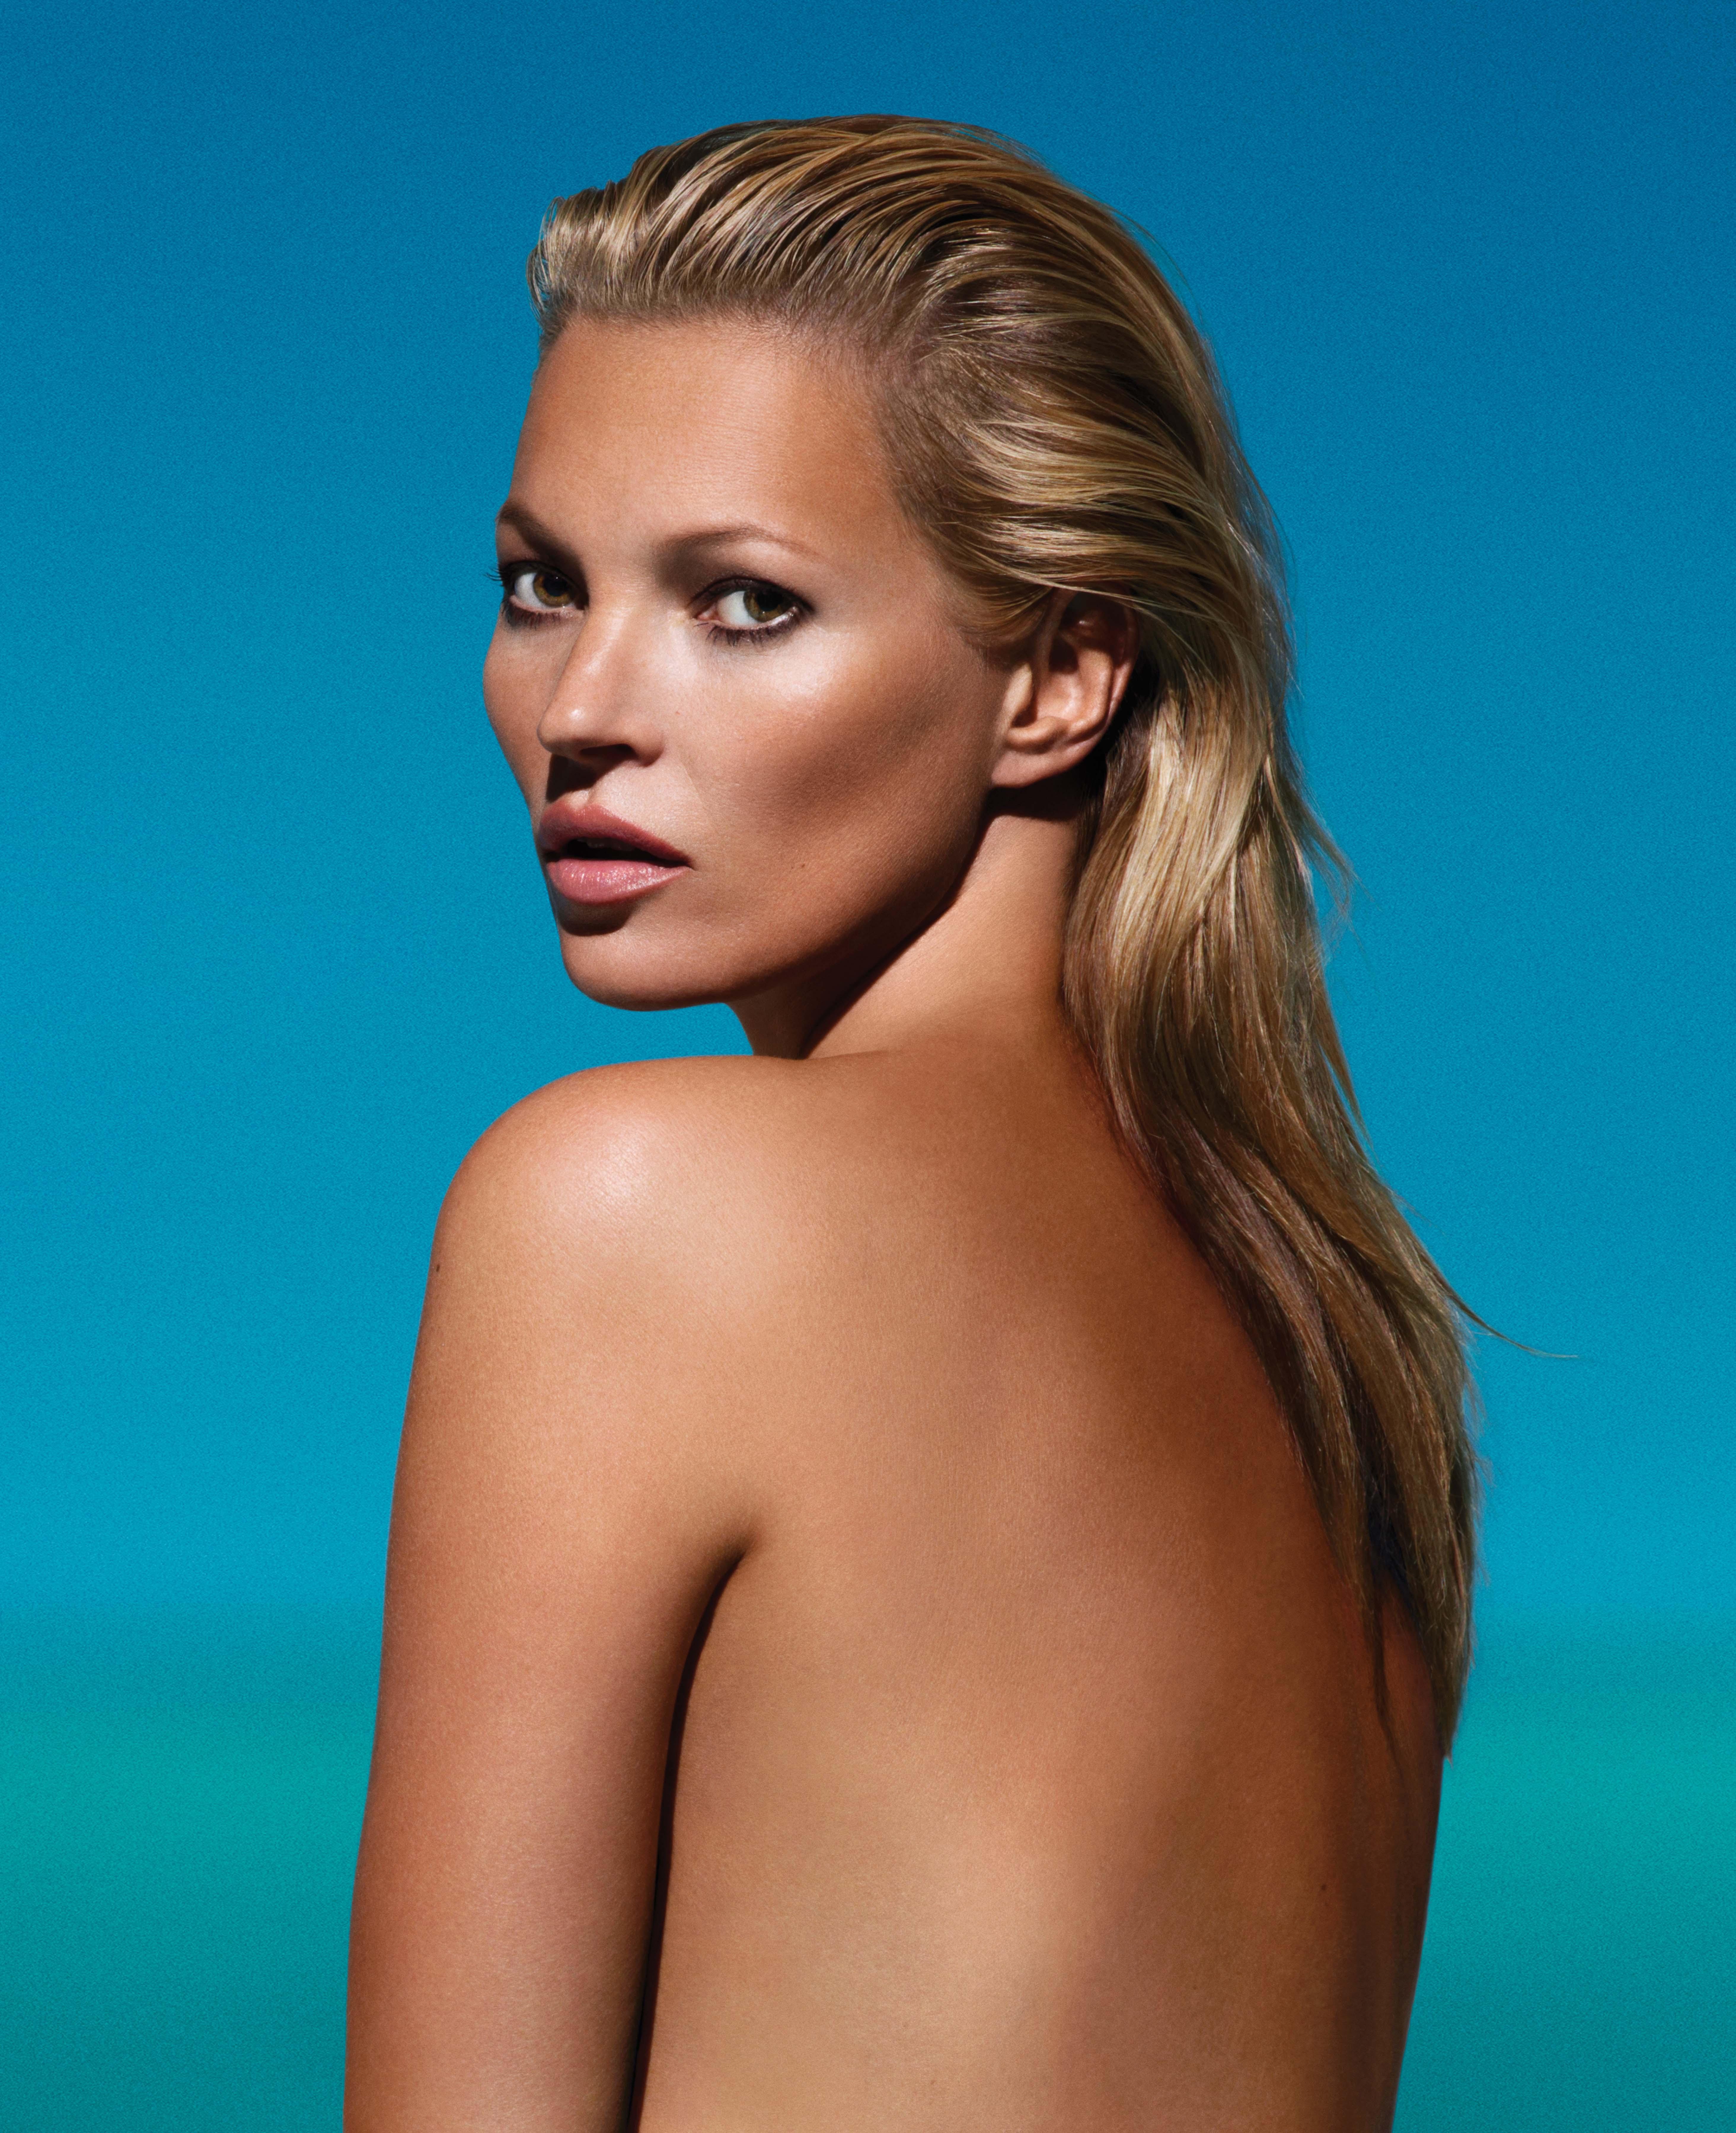 10-Beauty-Secrets-for-Women-from-the-Celebrities-6